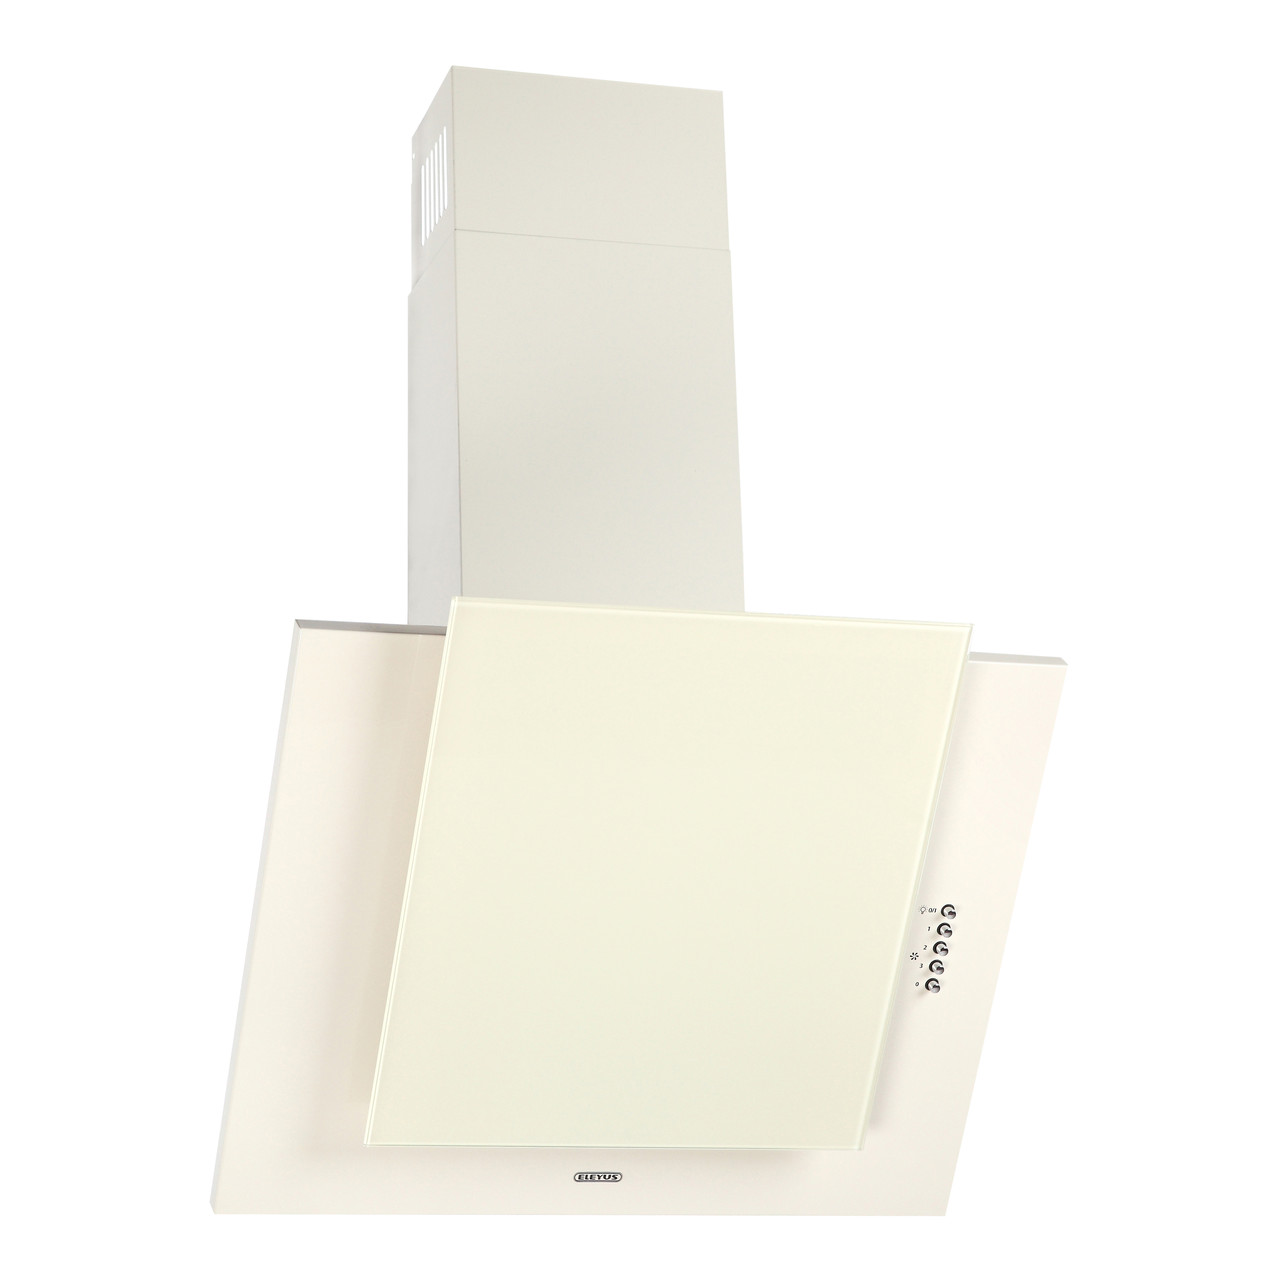 Витяжка кухонна ELEYUS Titan A 1000 LED SMD 60 BG